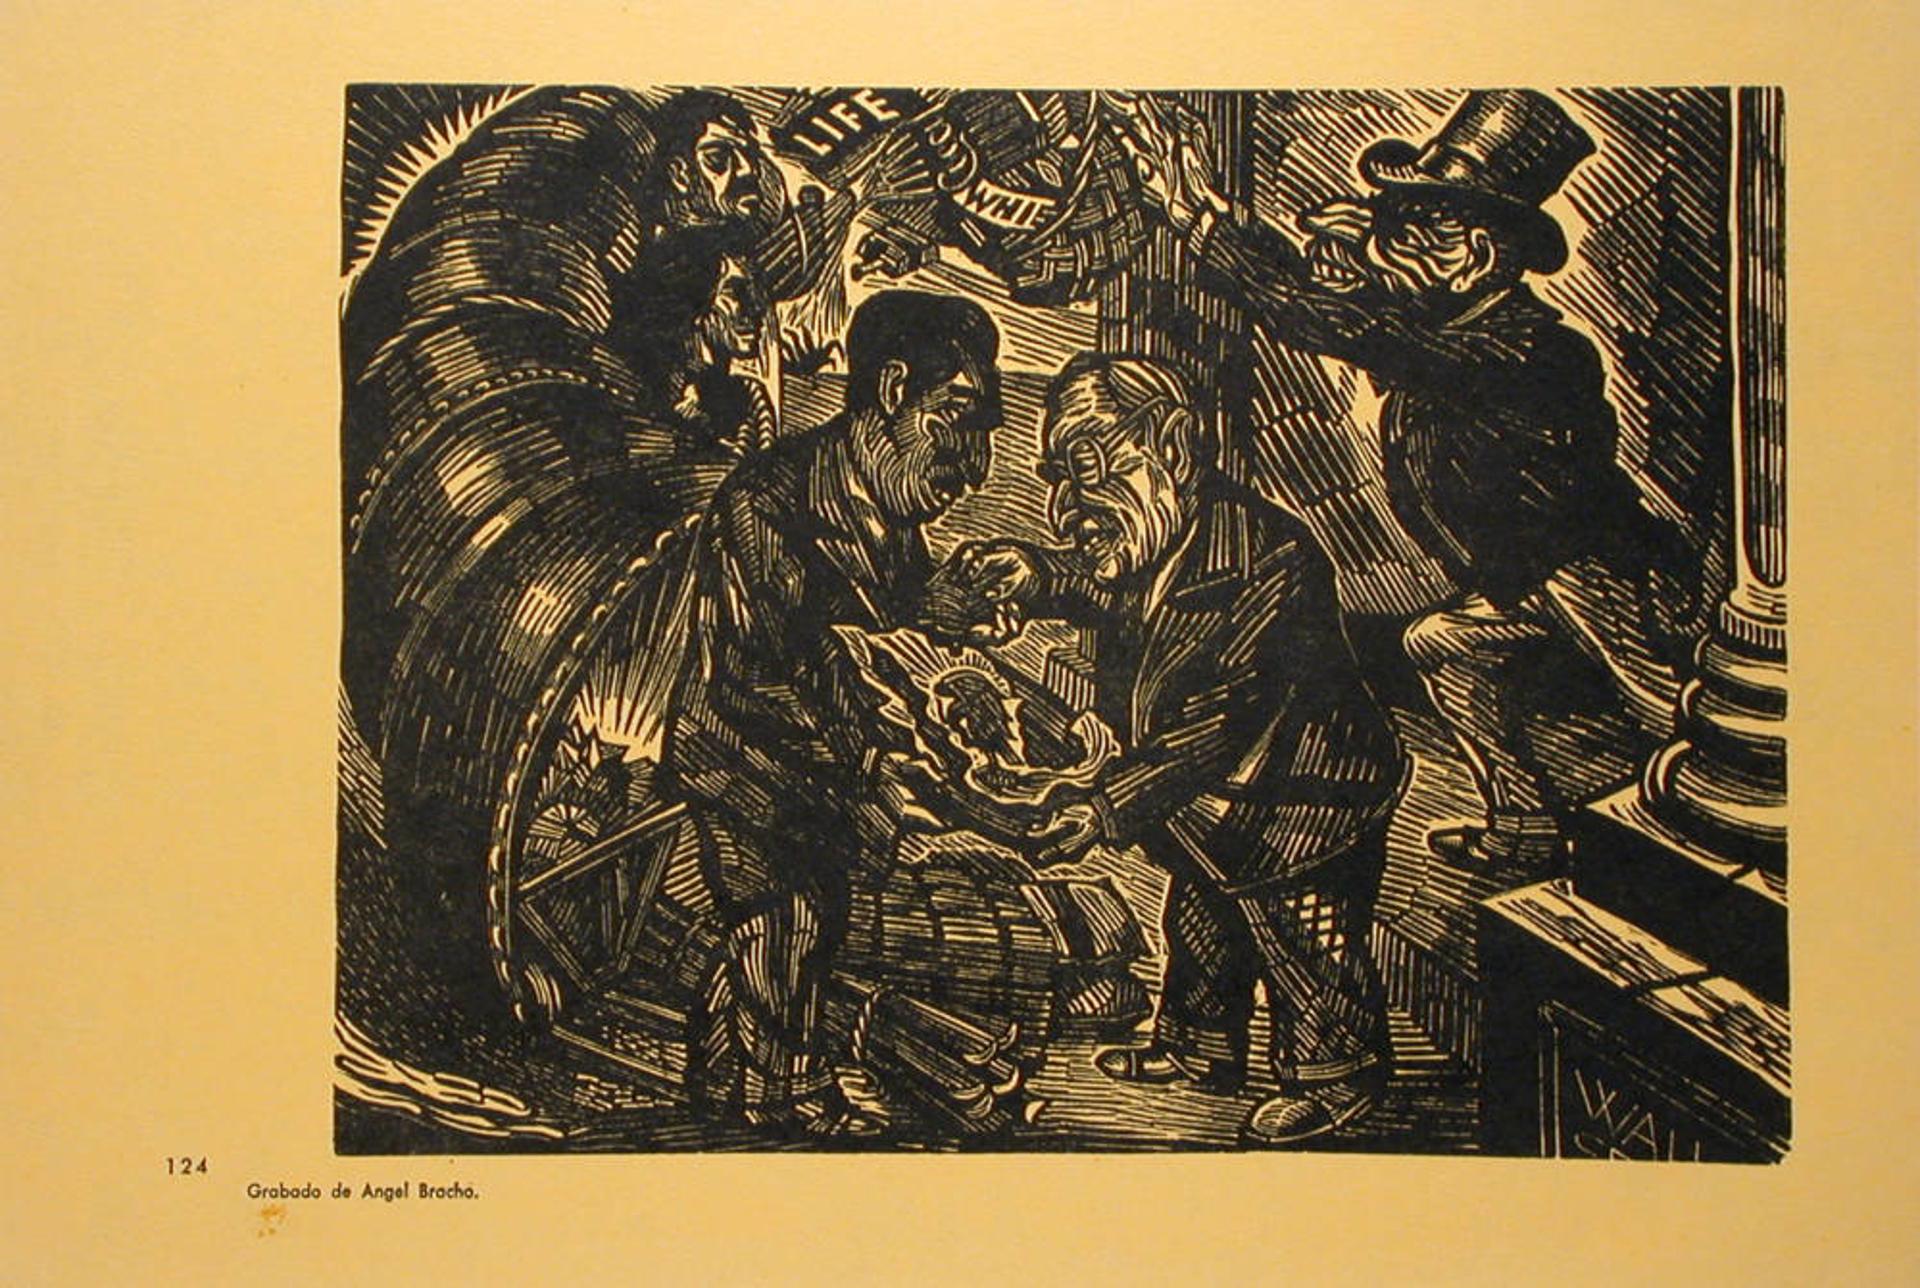 La Sociedad Alemán-Truman by Ángel Bracho (1911 - 2005)